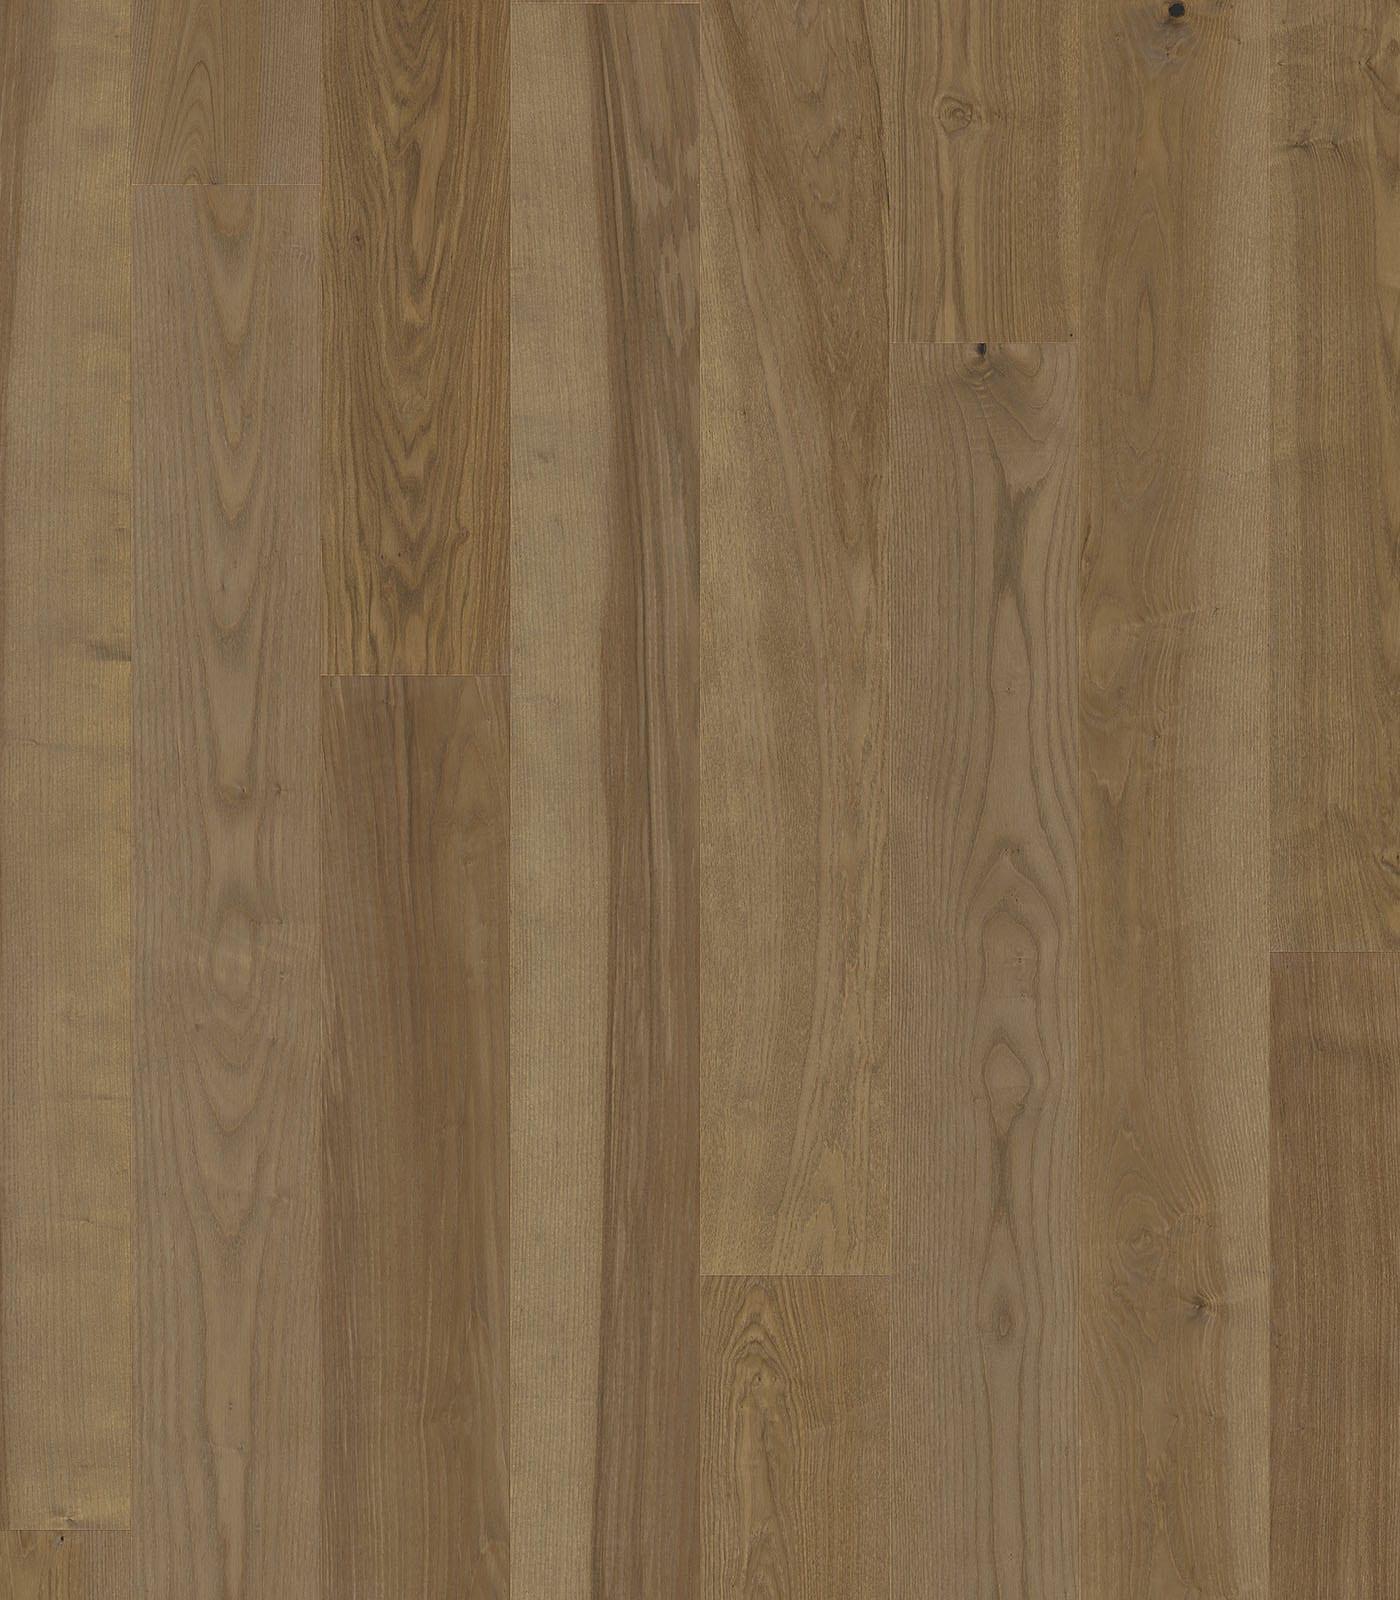 Sofia-European Ash floors-After Oak Collection - flat